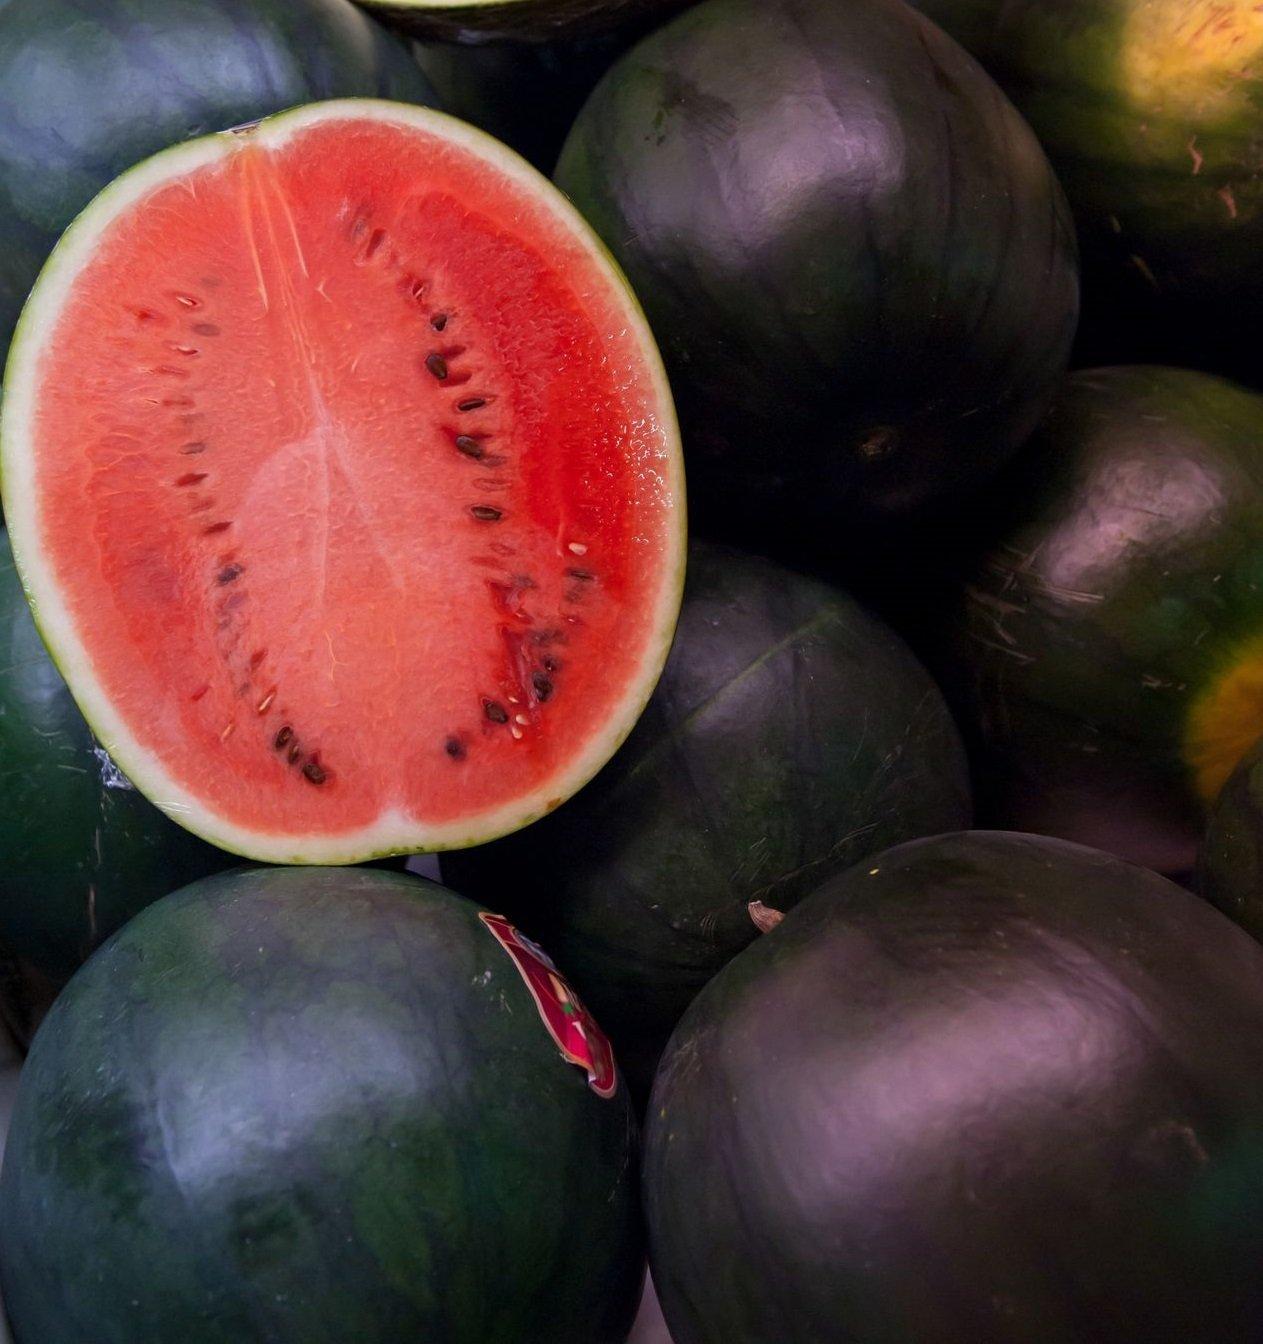 TiTCool Womens Maternity Shirts Summer Sleeveless Cami Racer Back Tank Tops Funny Print-Dont eat Watermelon Seeds